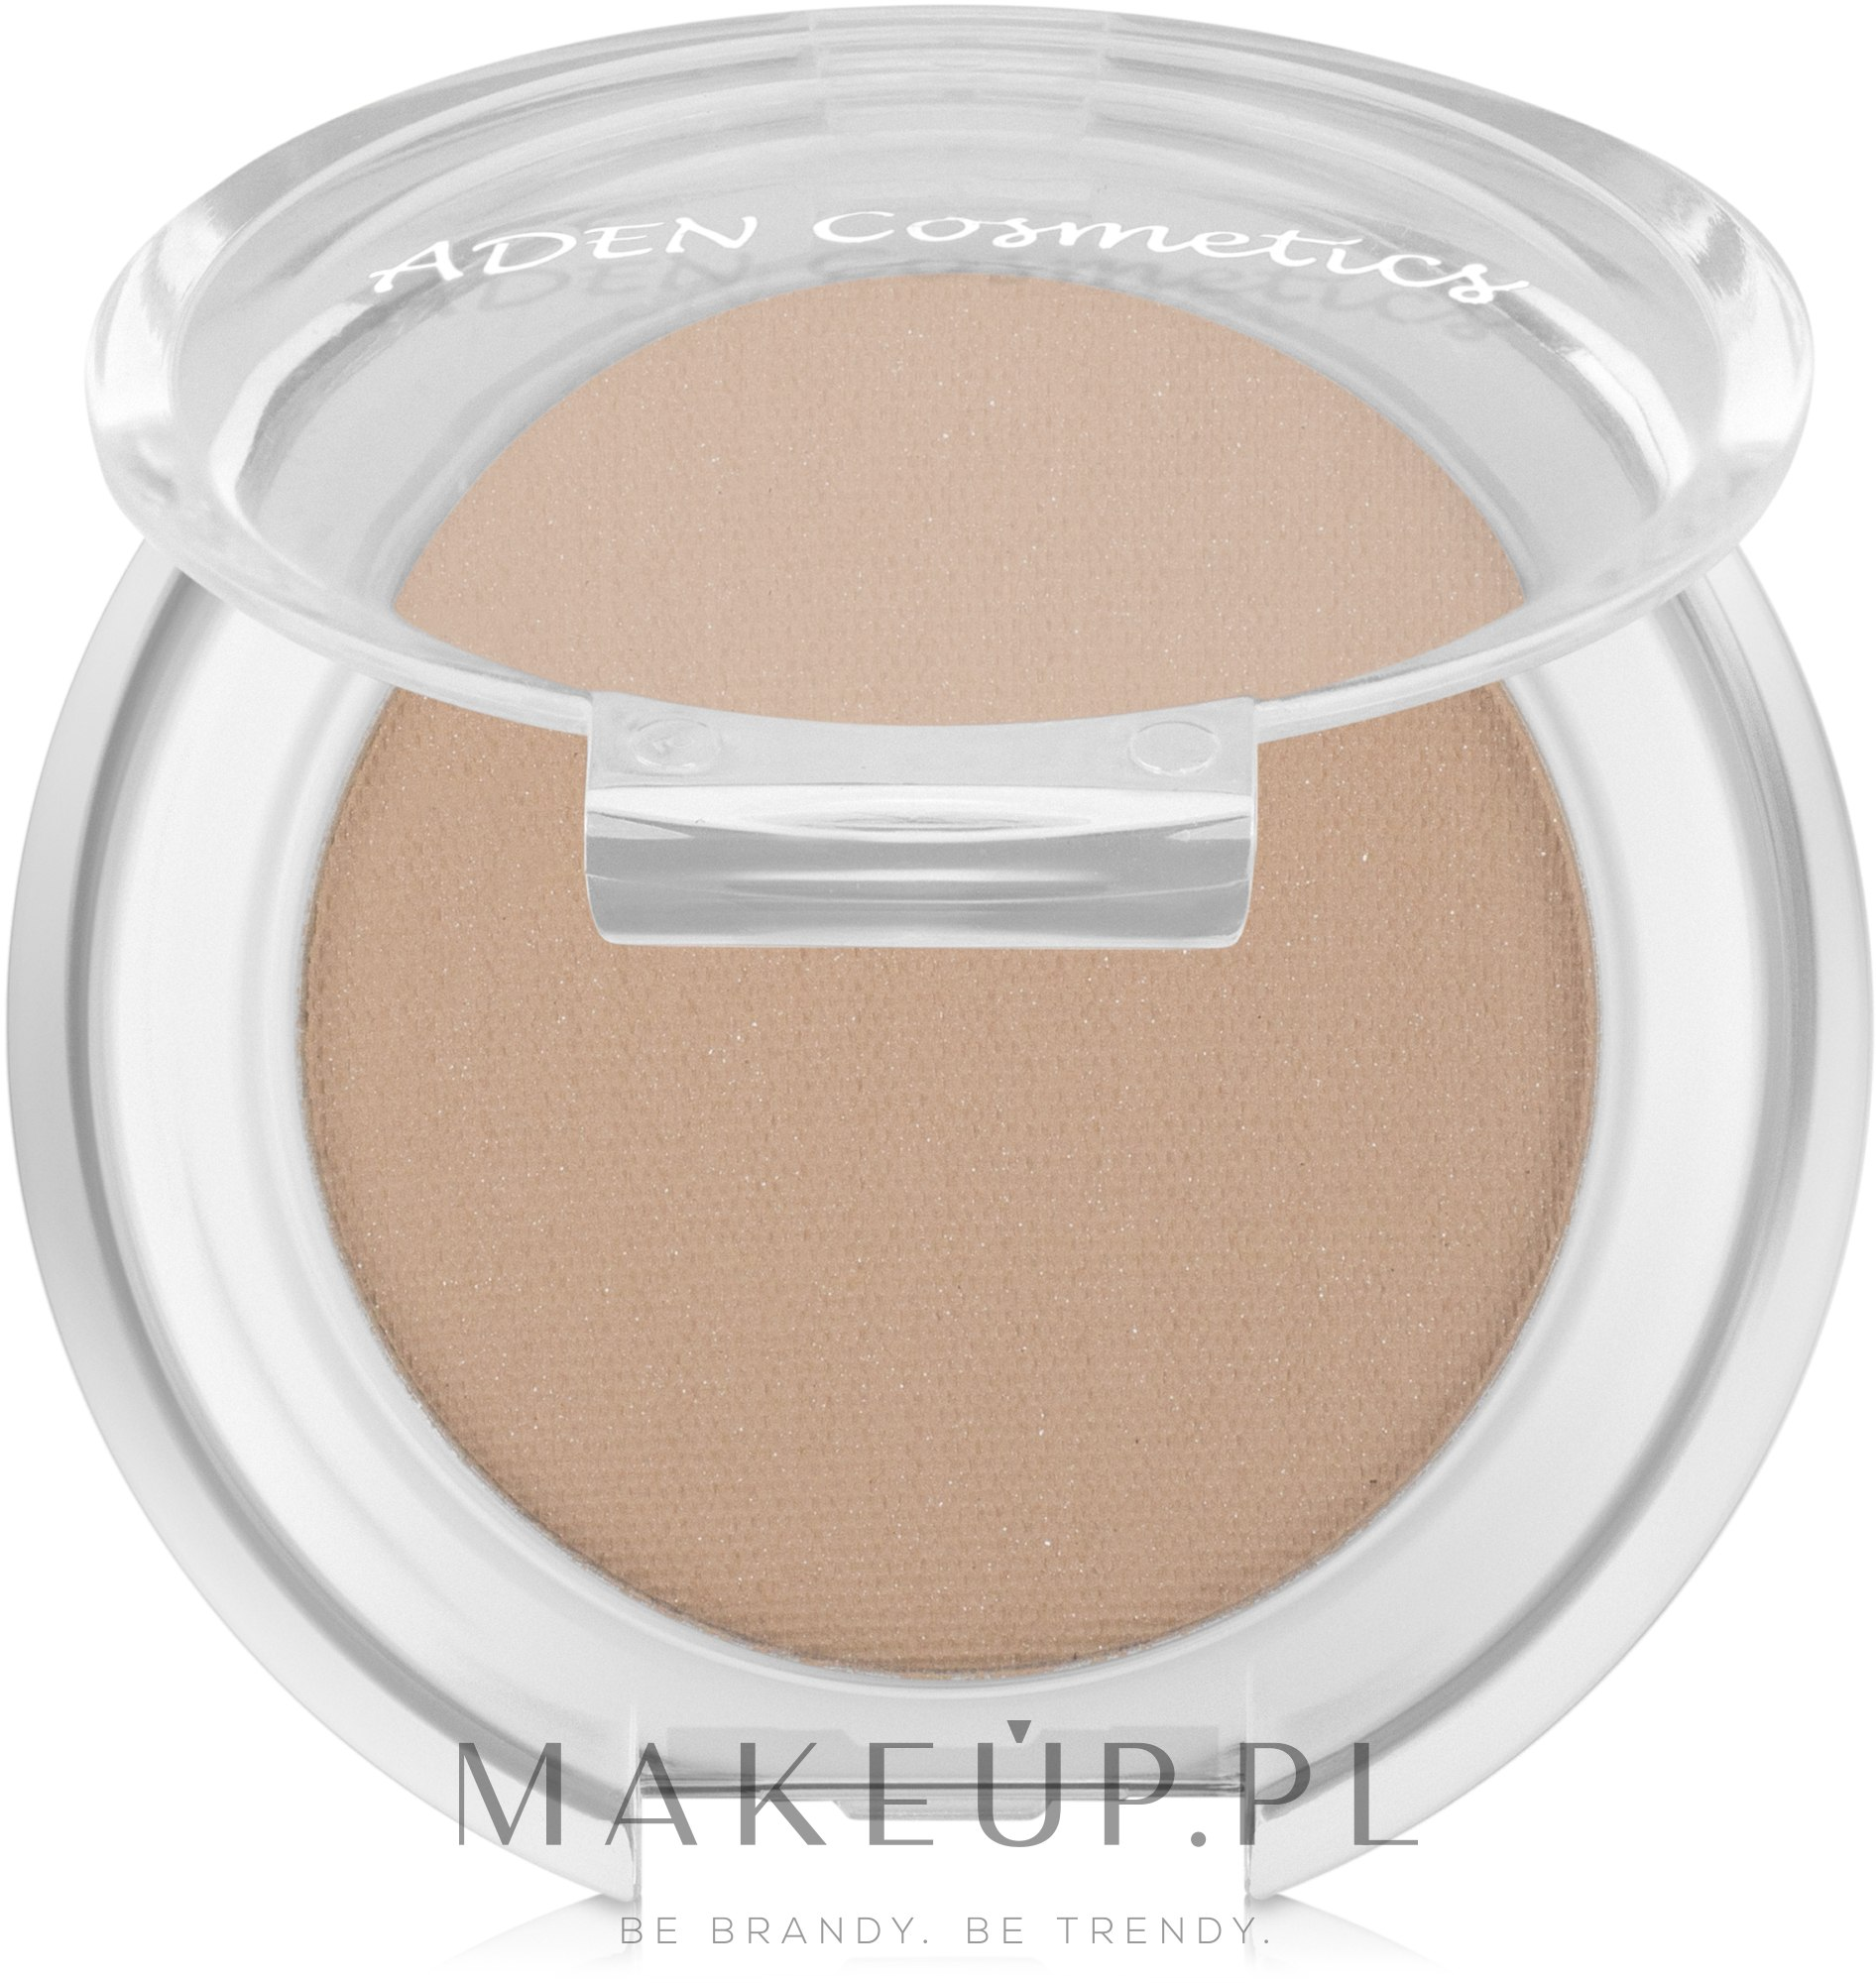 Cień do brwi - Aden Cosmetics Eyebrow Shadow Powder — фото 01 - Blonde